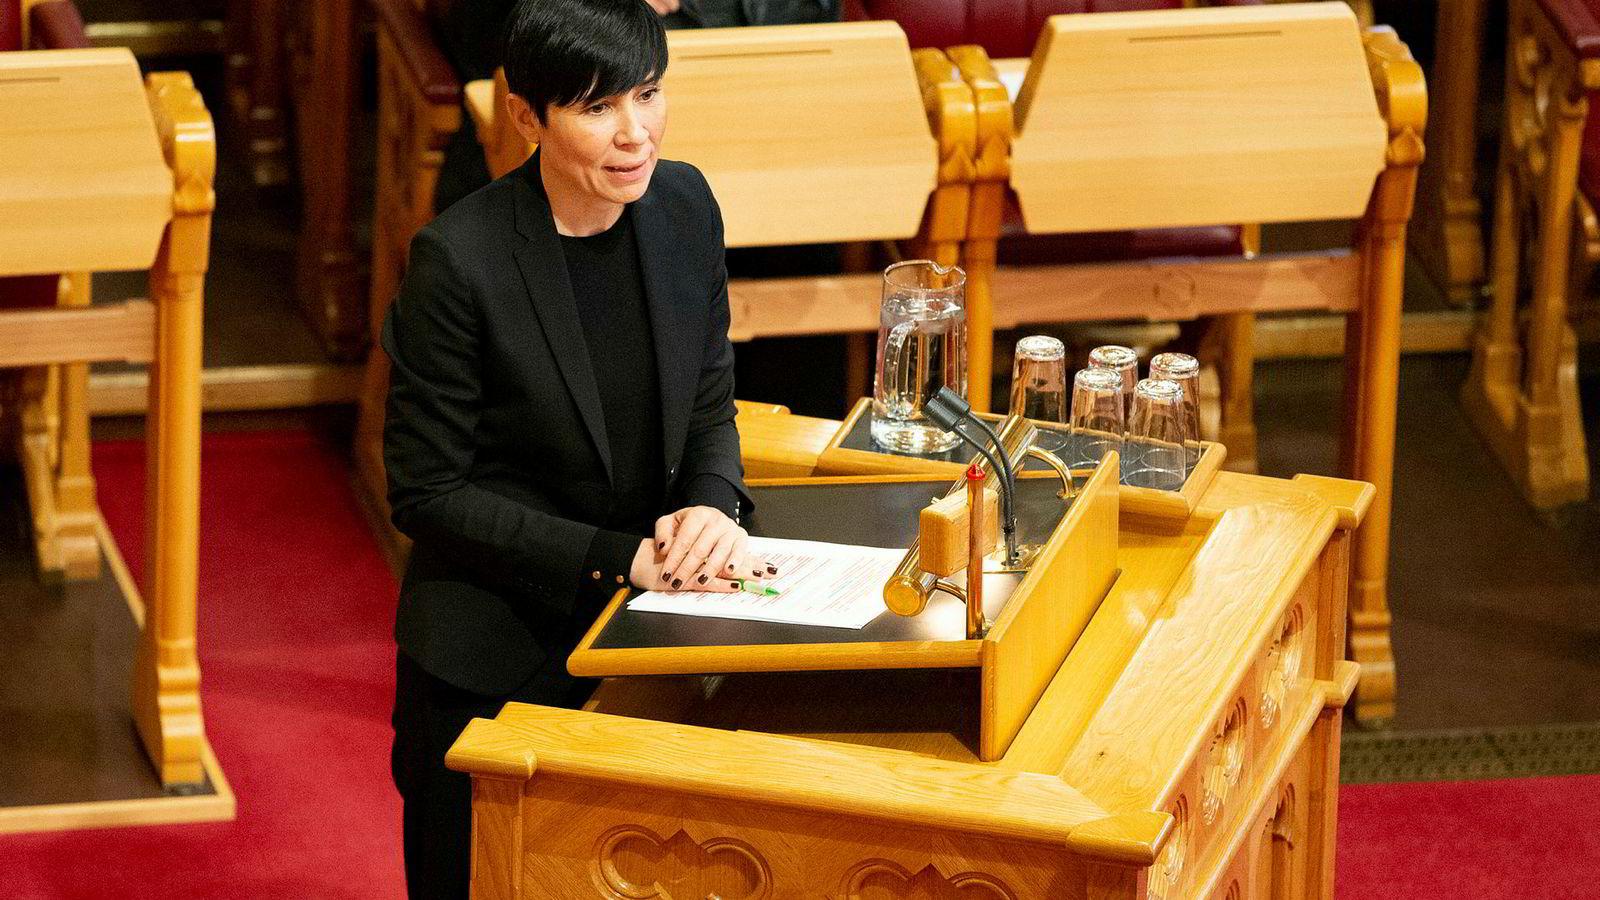 Utenriksminister Ine Eriksen Søreide (H) under Stortingets muntlige spørretime onsdag formiddag.